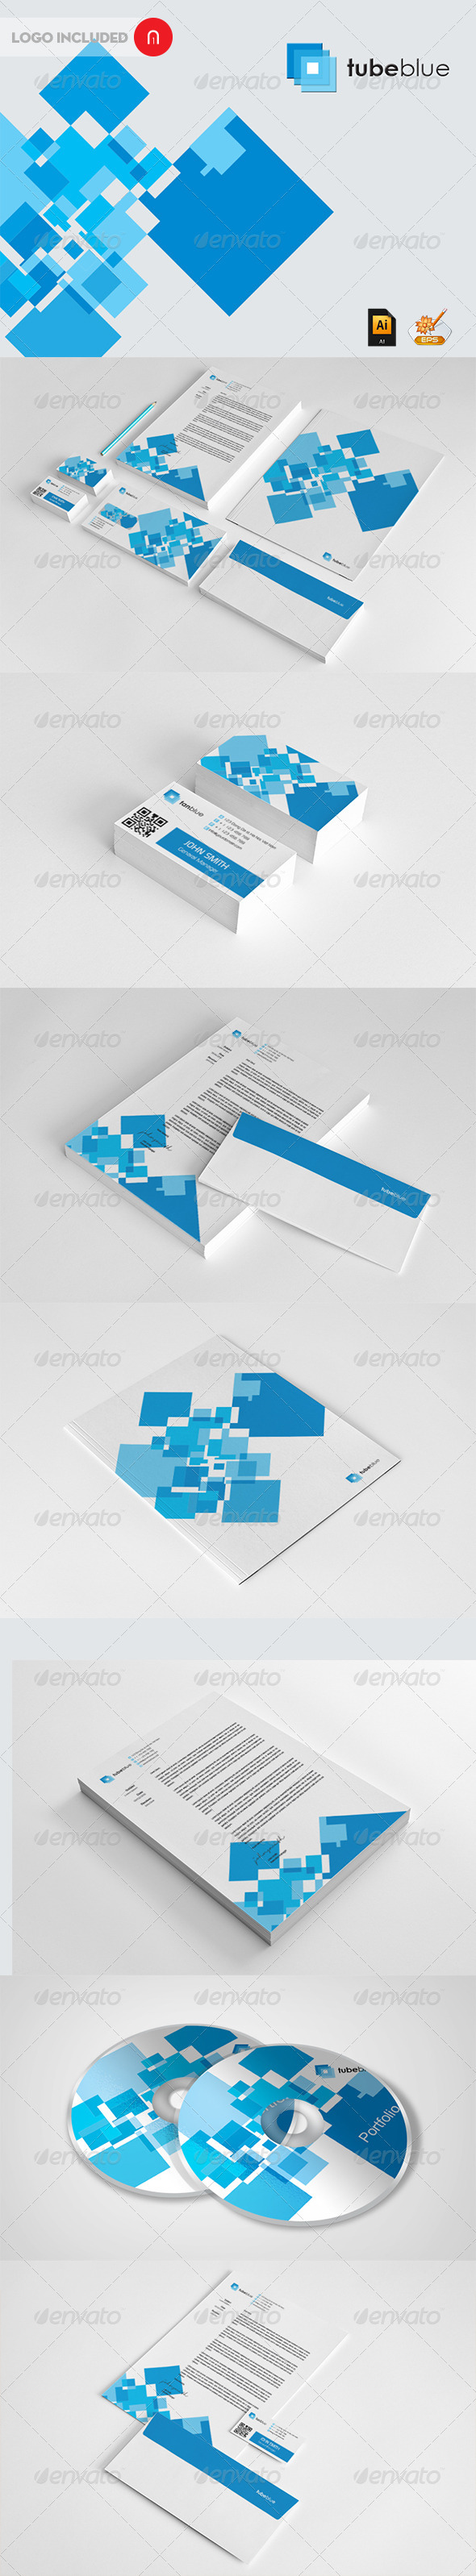 Stationary & Identity - Tube Blue - Stationery Print Templates